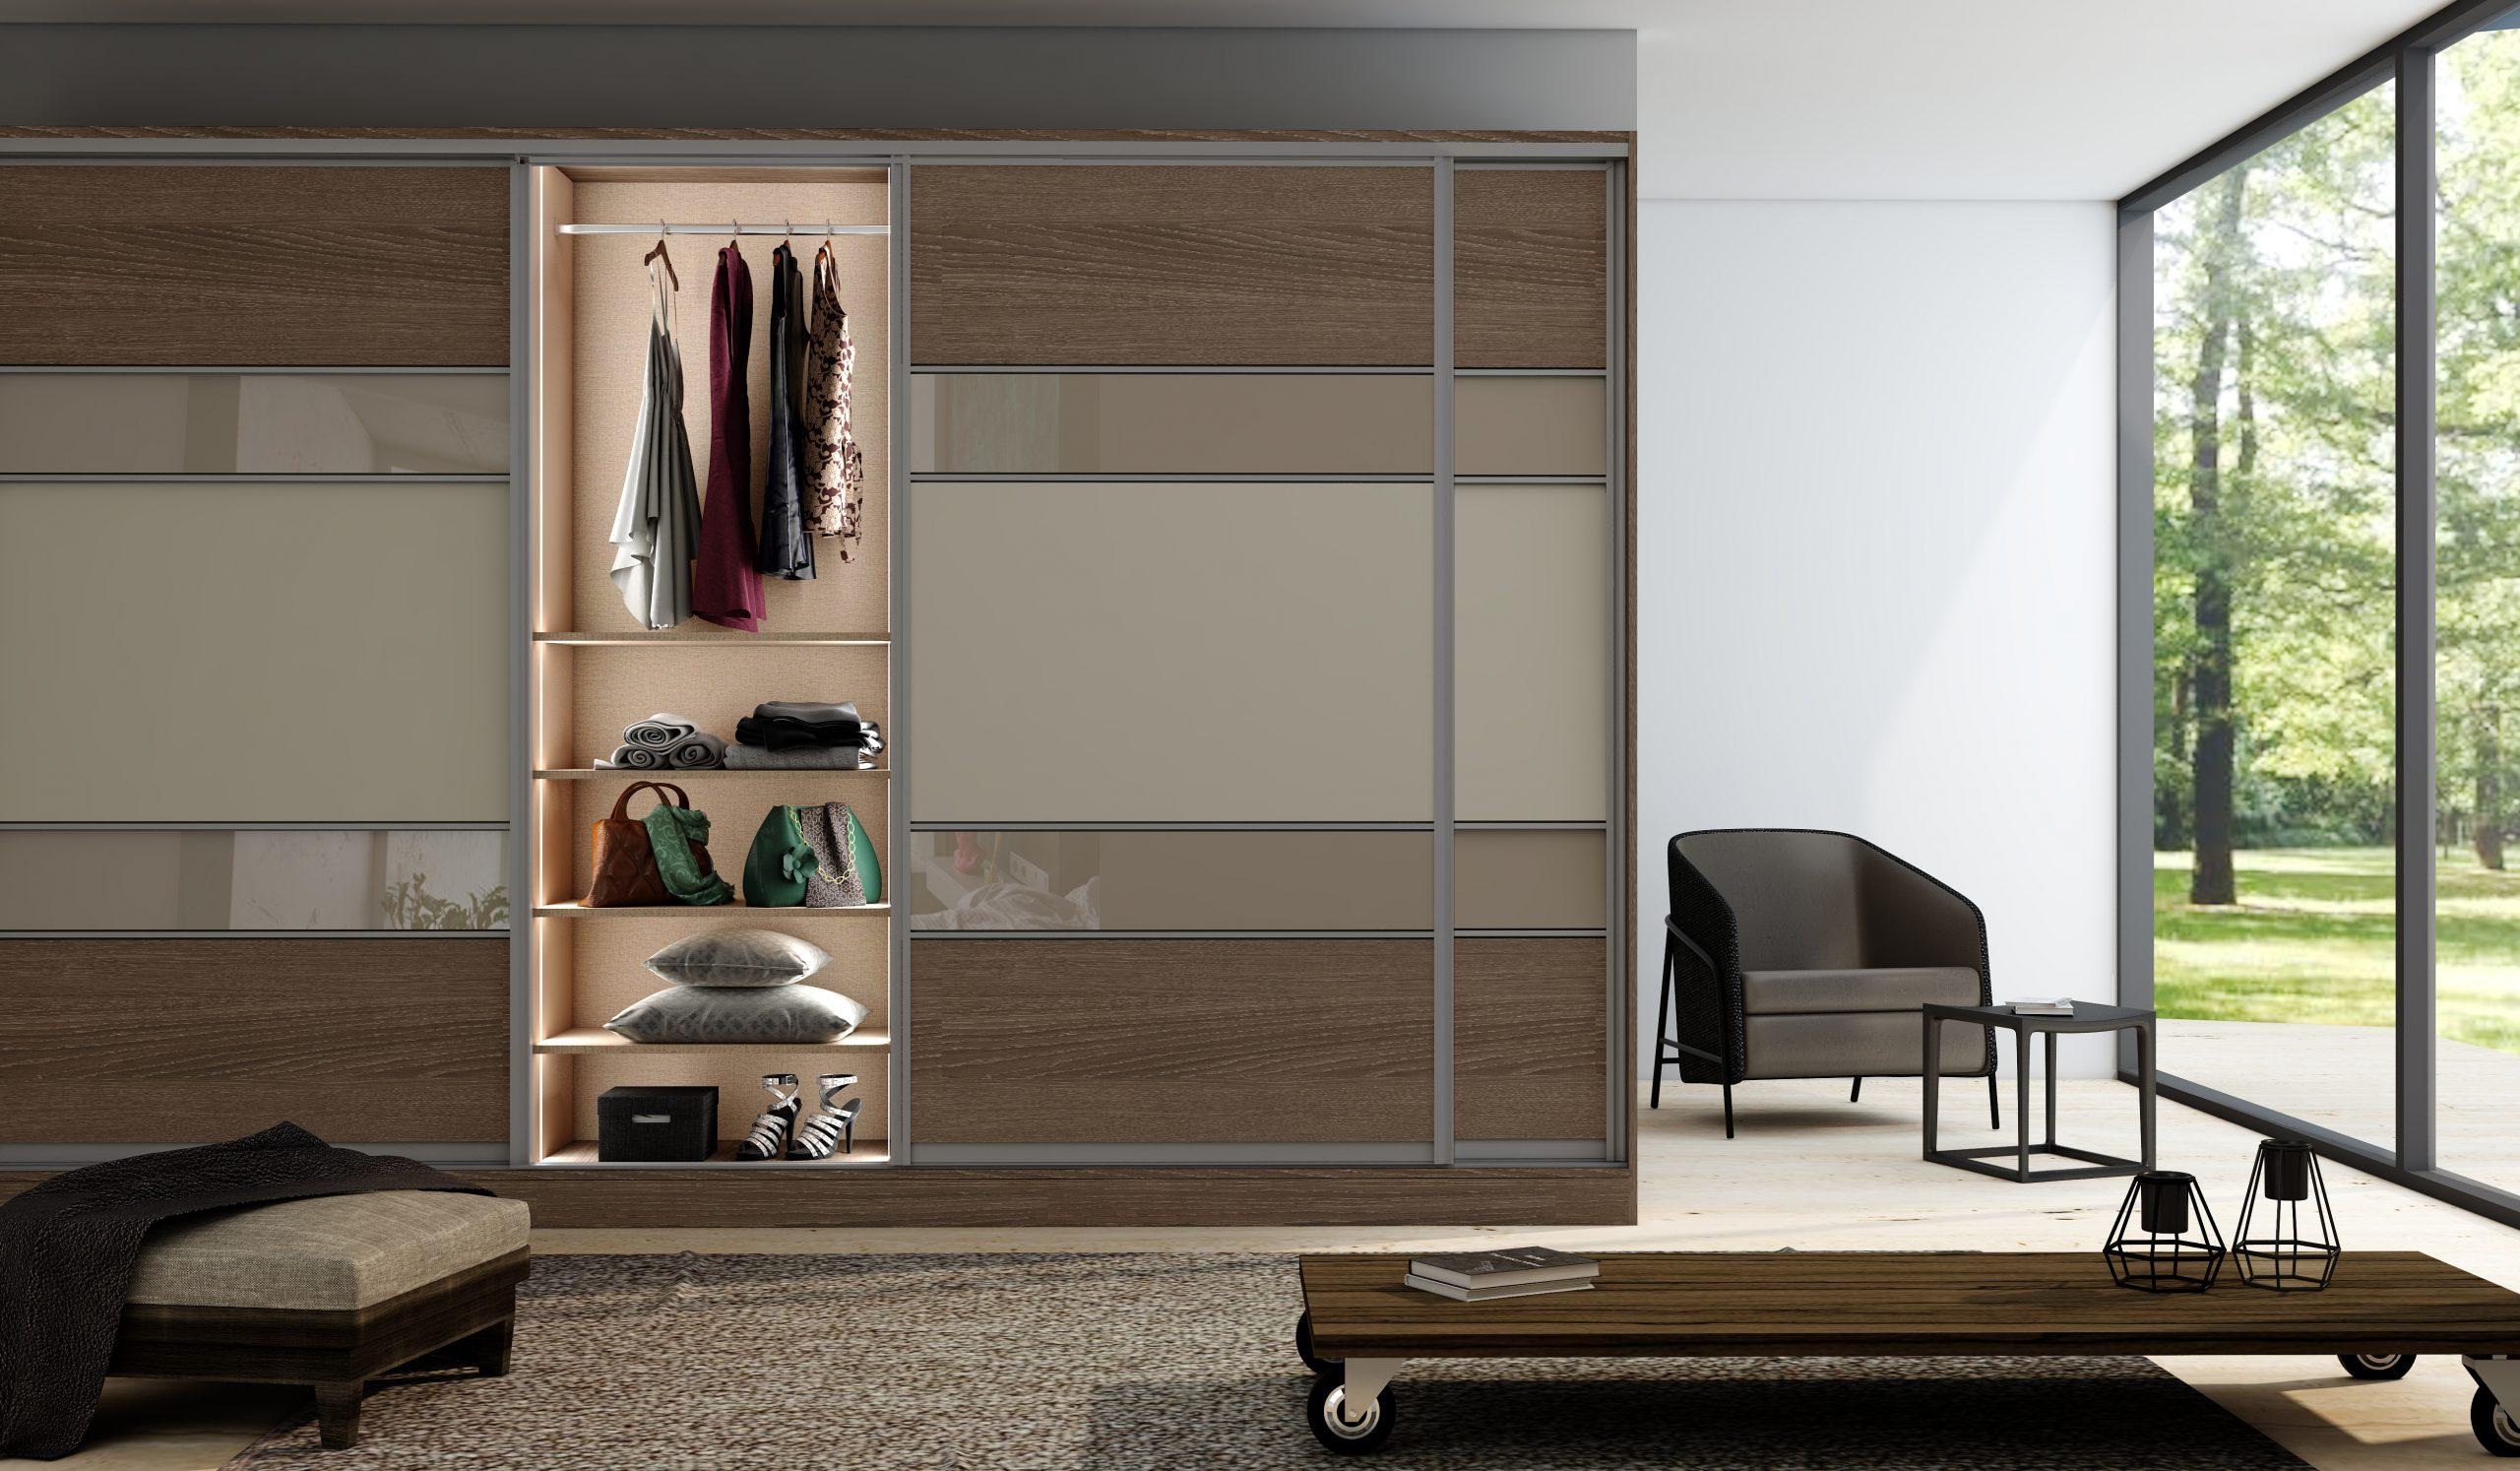 Wooden Built-in Sliding Fitted Wardrobe Oak With Five Panels in Combination of Dark Woodgrain